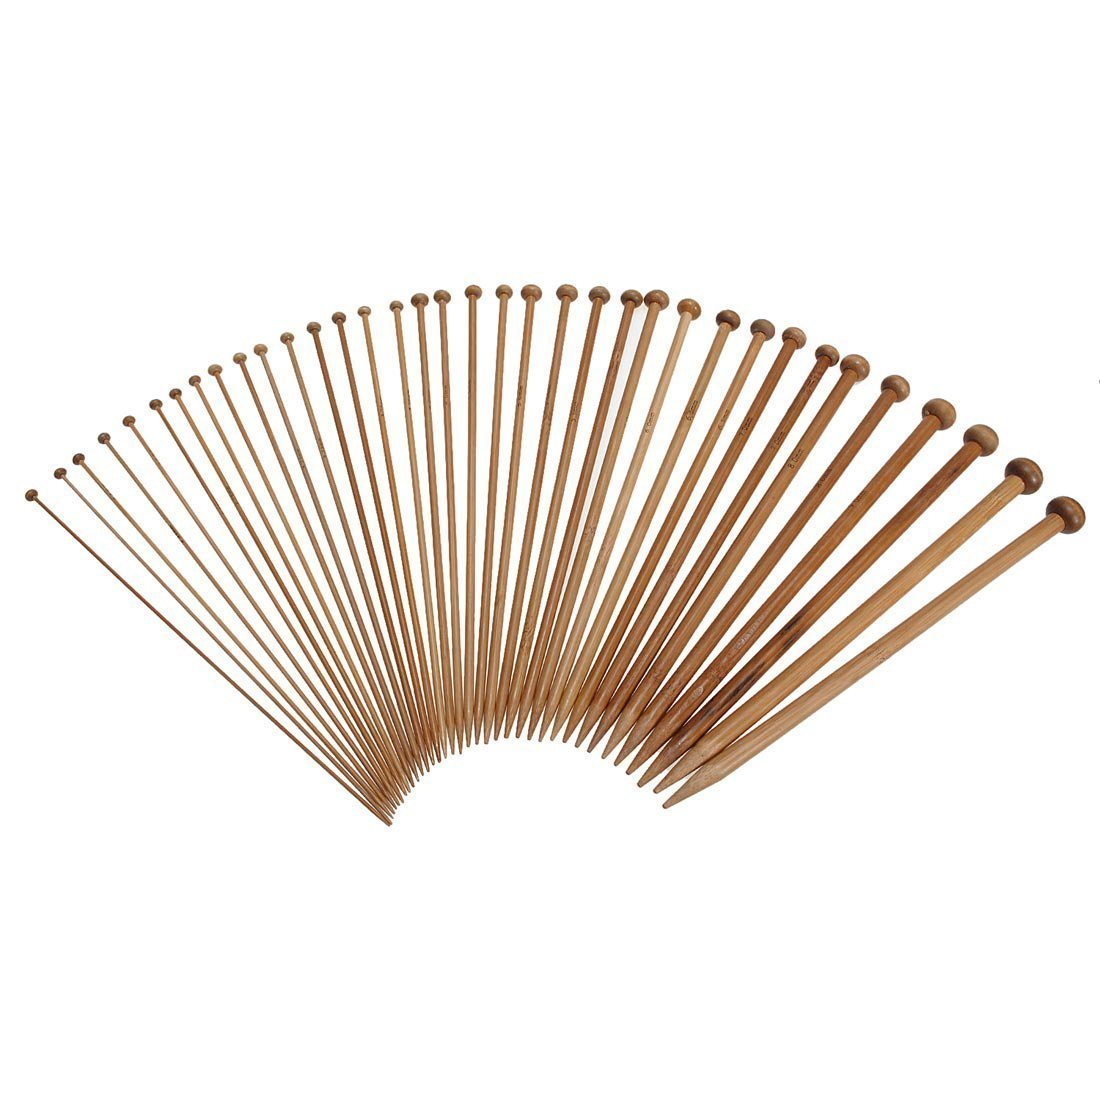 36 Pieces 18 Sizes Carbonized Bamboo Crochet Knitting Needles Single Tip Needles